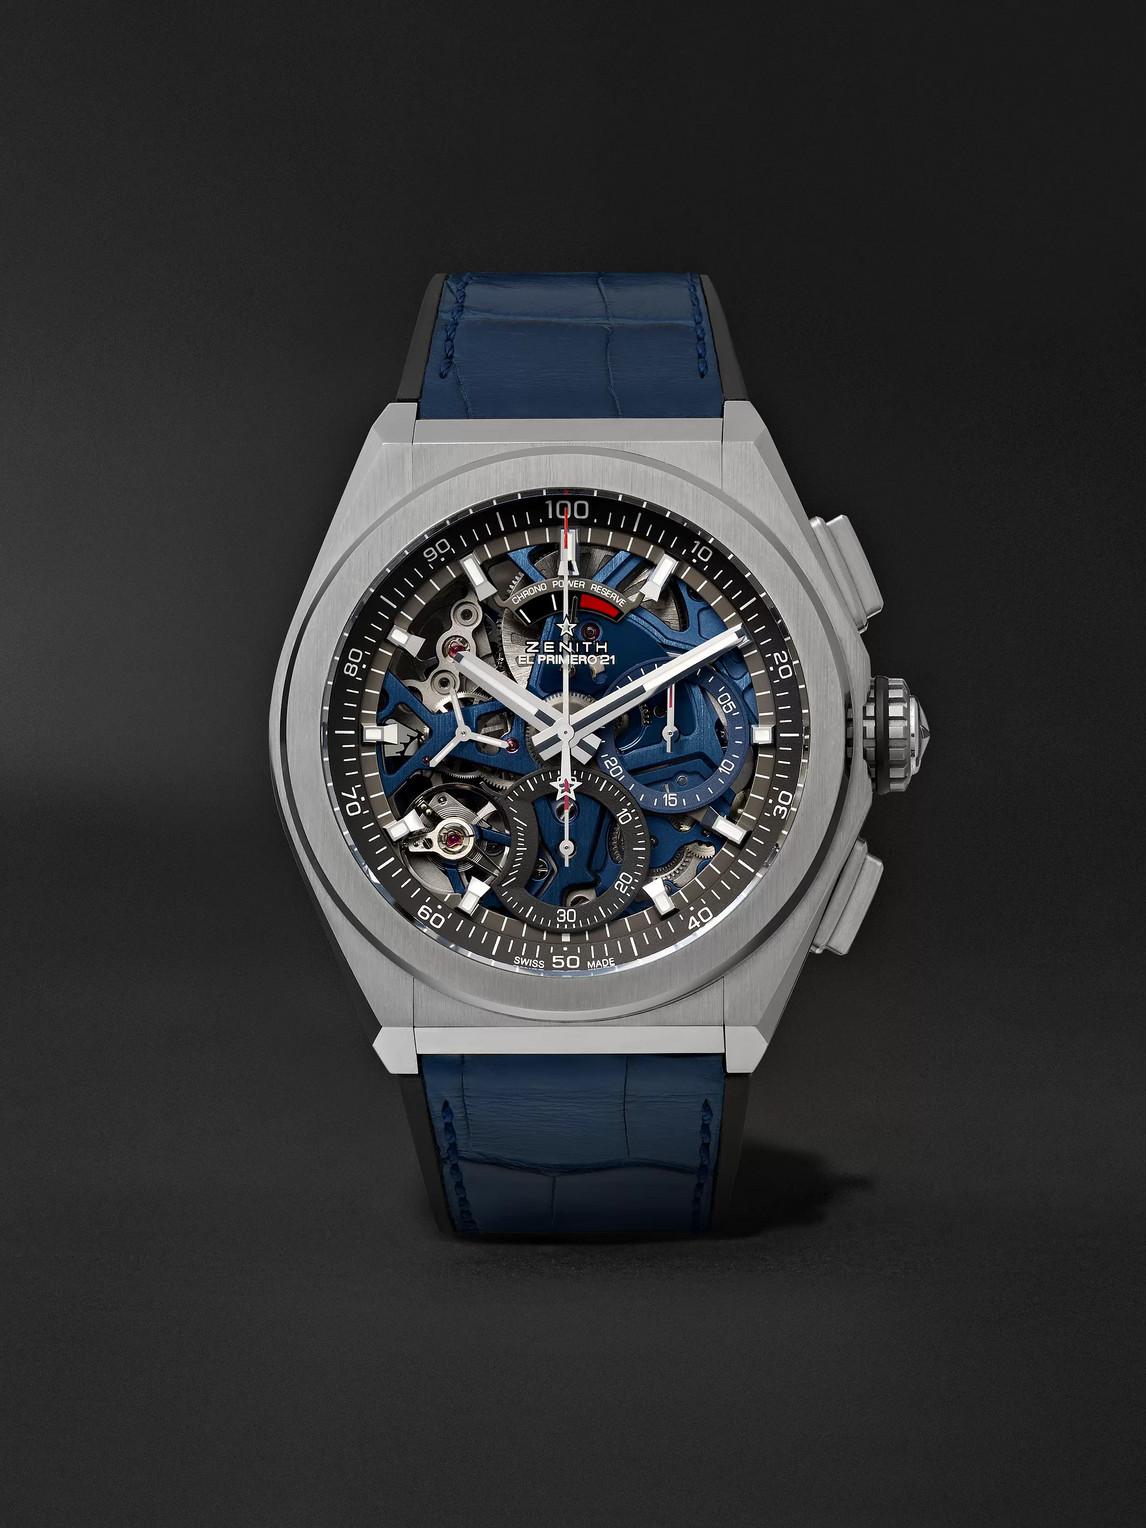 Zenith Defy El Primero 21 Chronograph 44mm Brushed-titanium, Alligator And Rubber Watch, Ref. No. 95.9002.9 In Blue